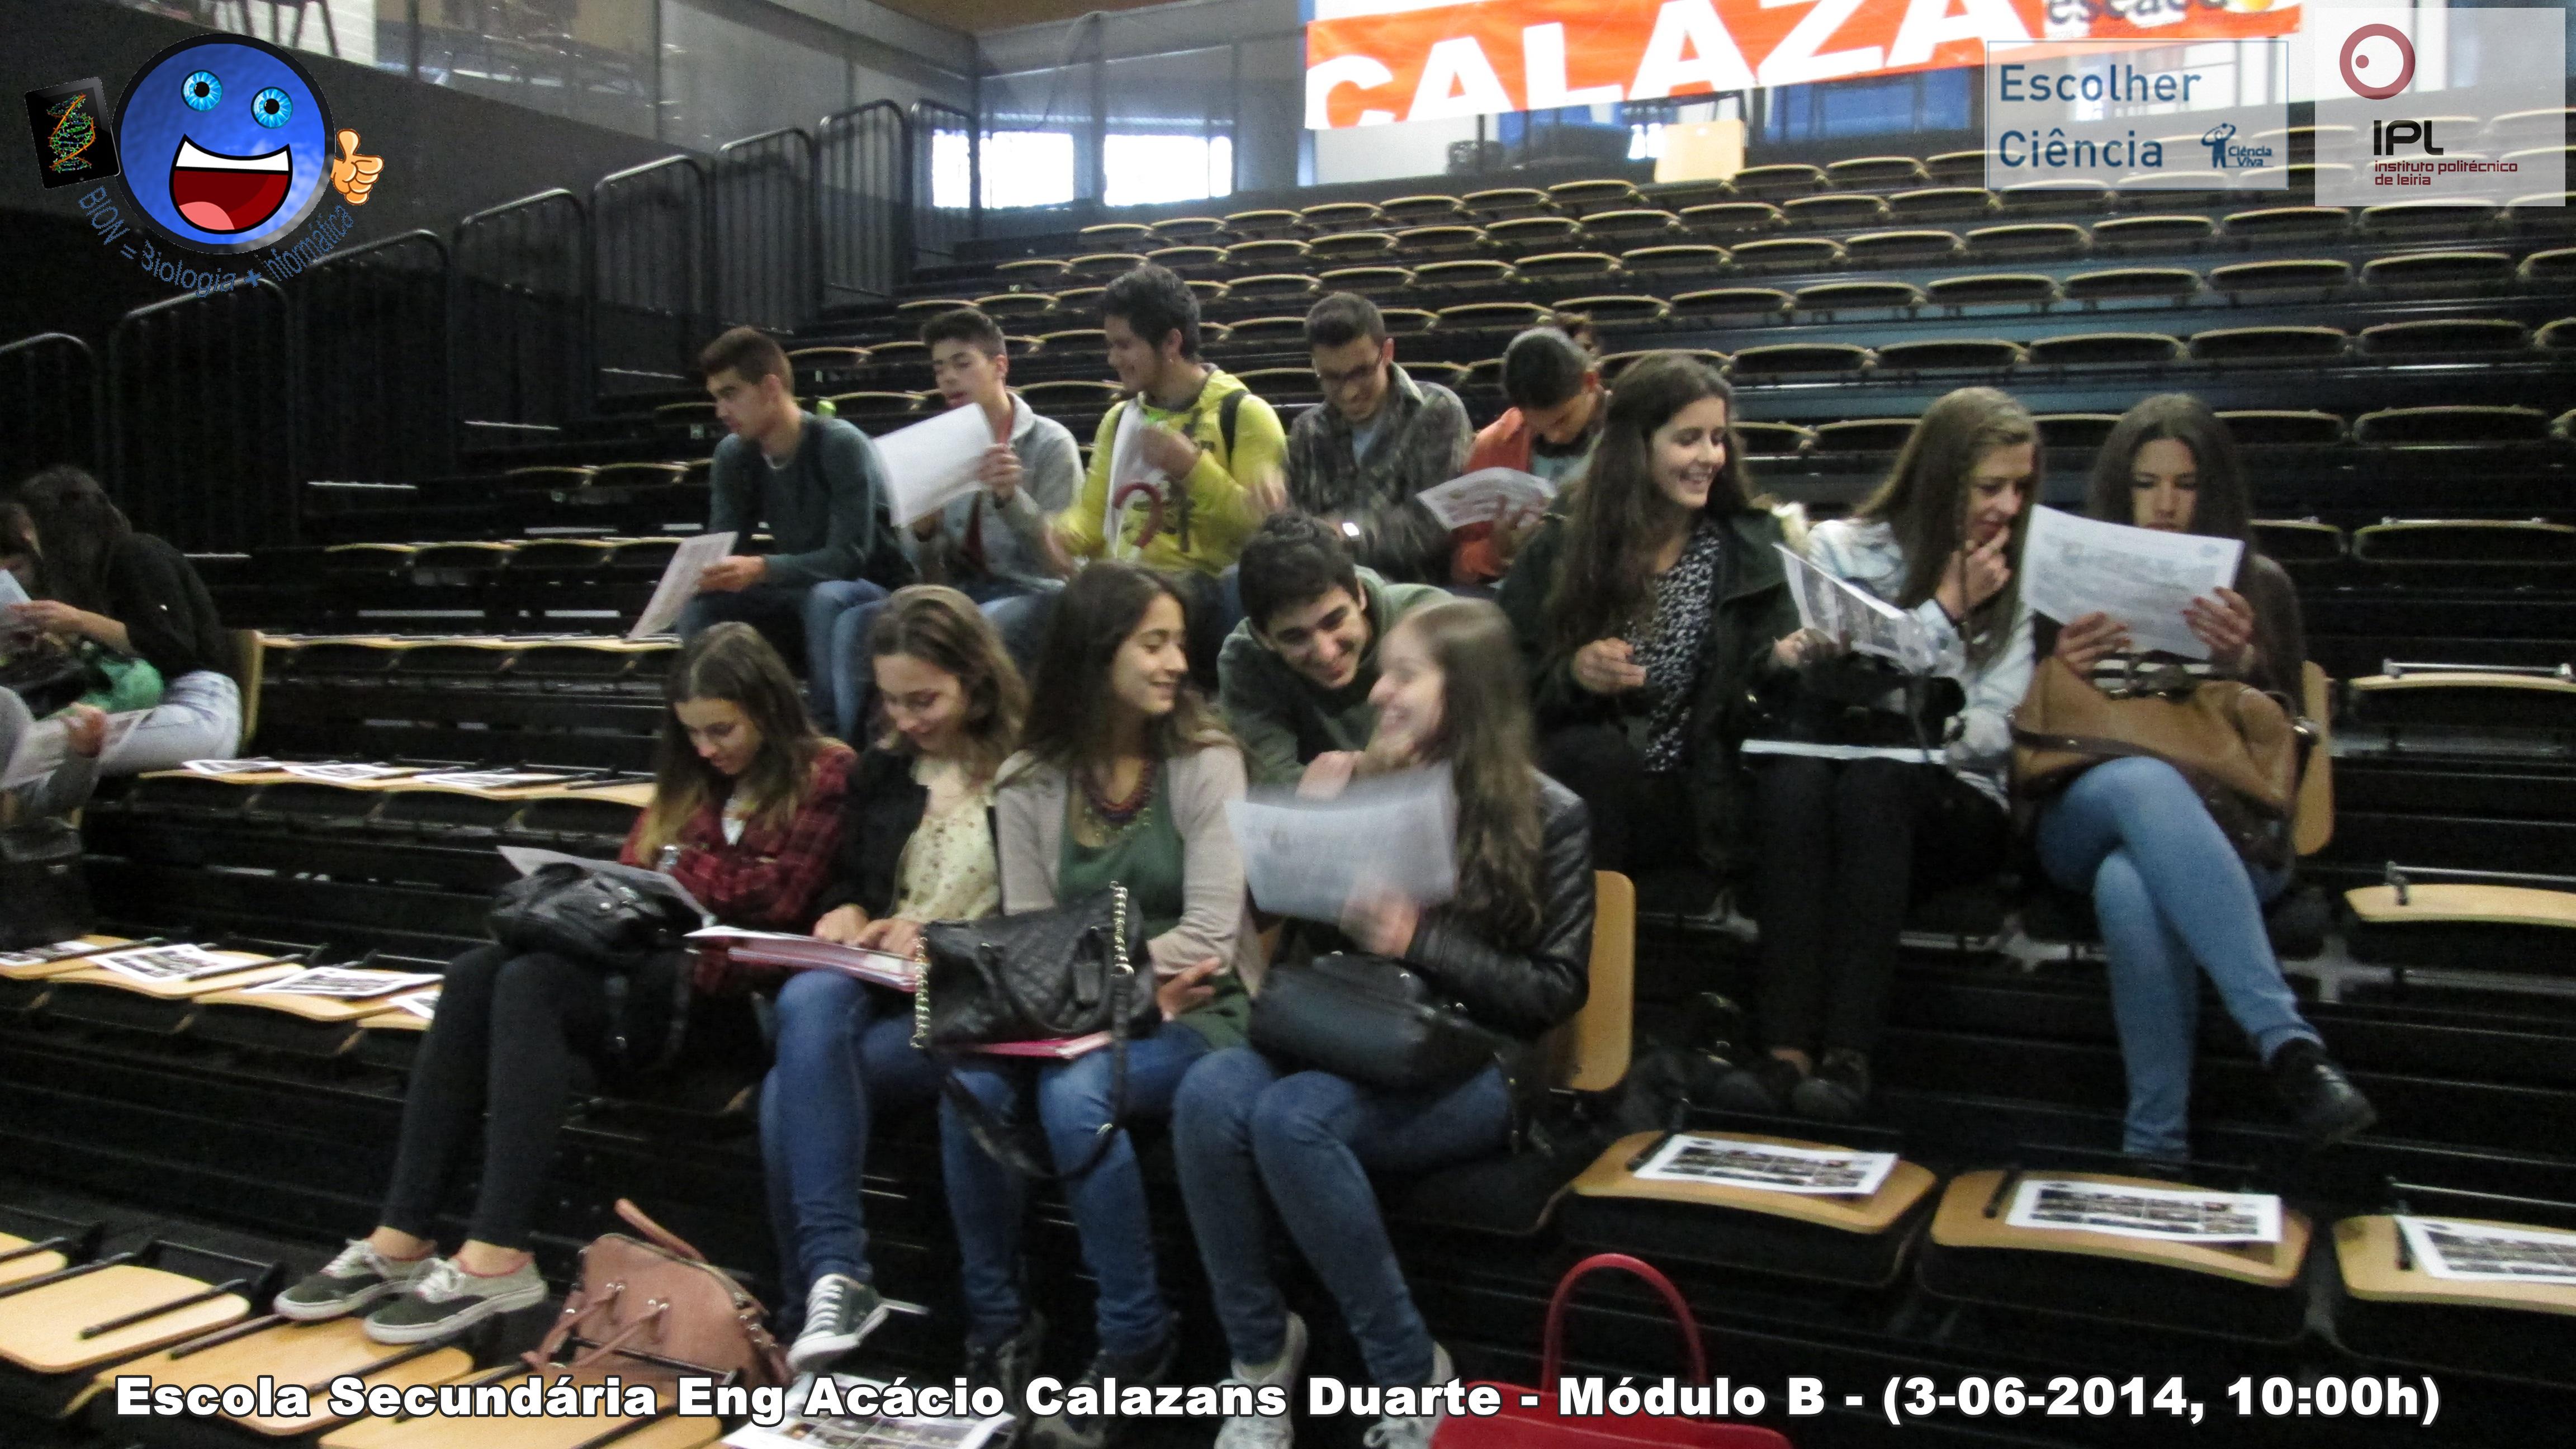 Modulo B - Escola Sec. Eng. Acácio Calazans Duarte